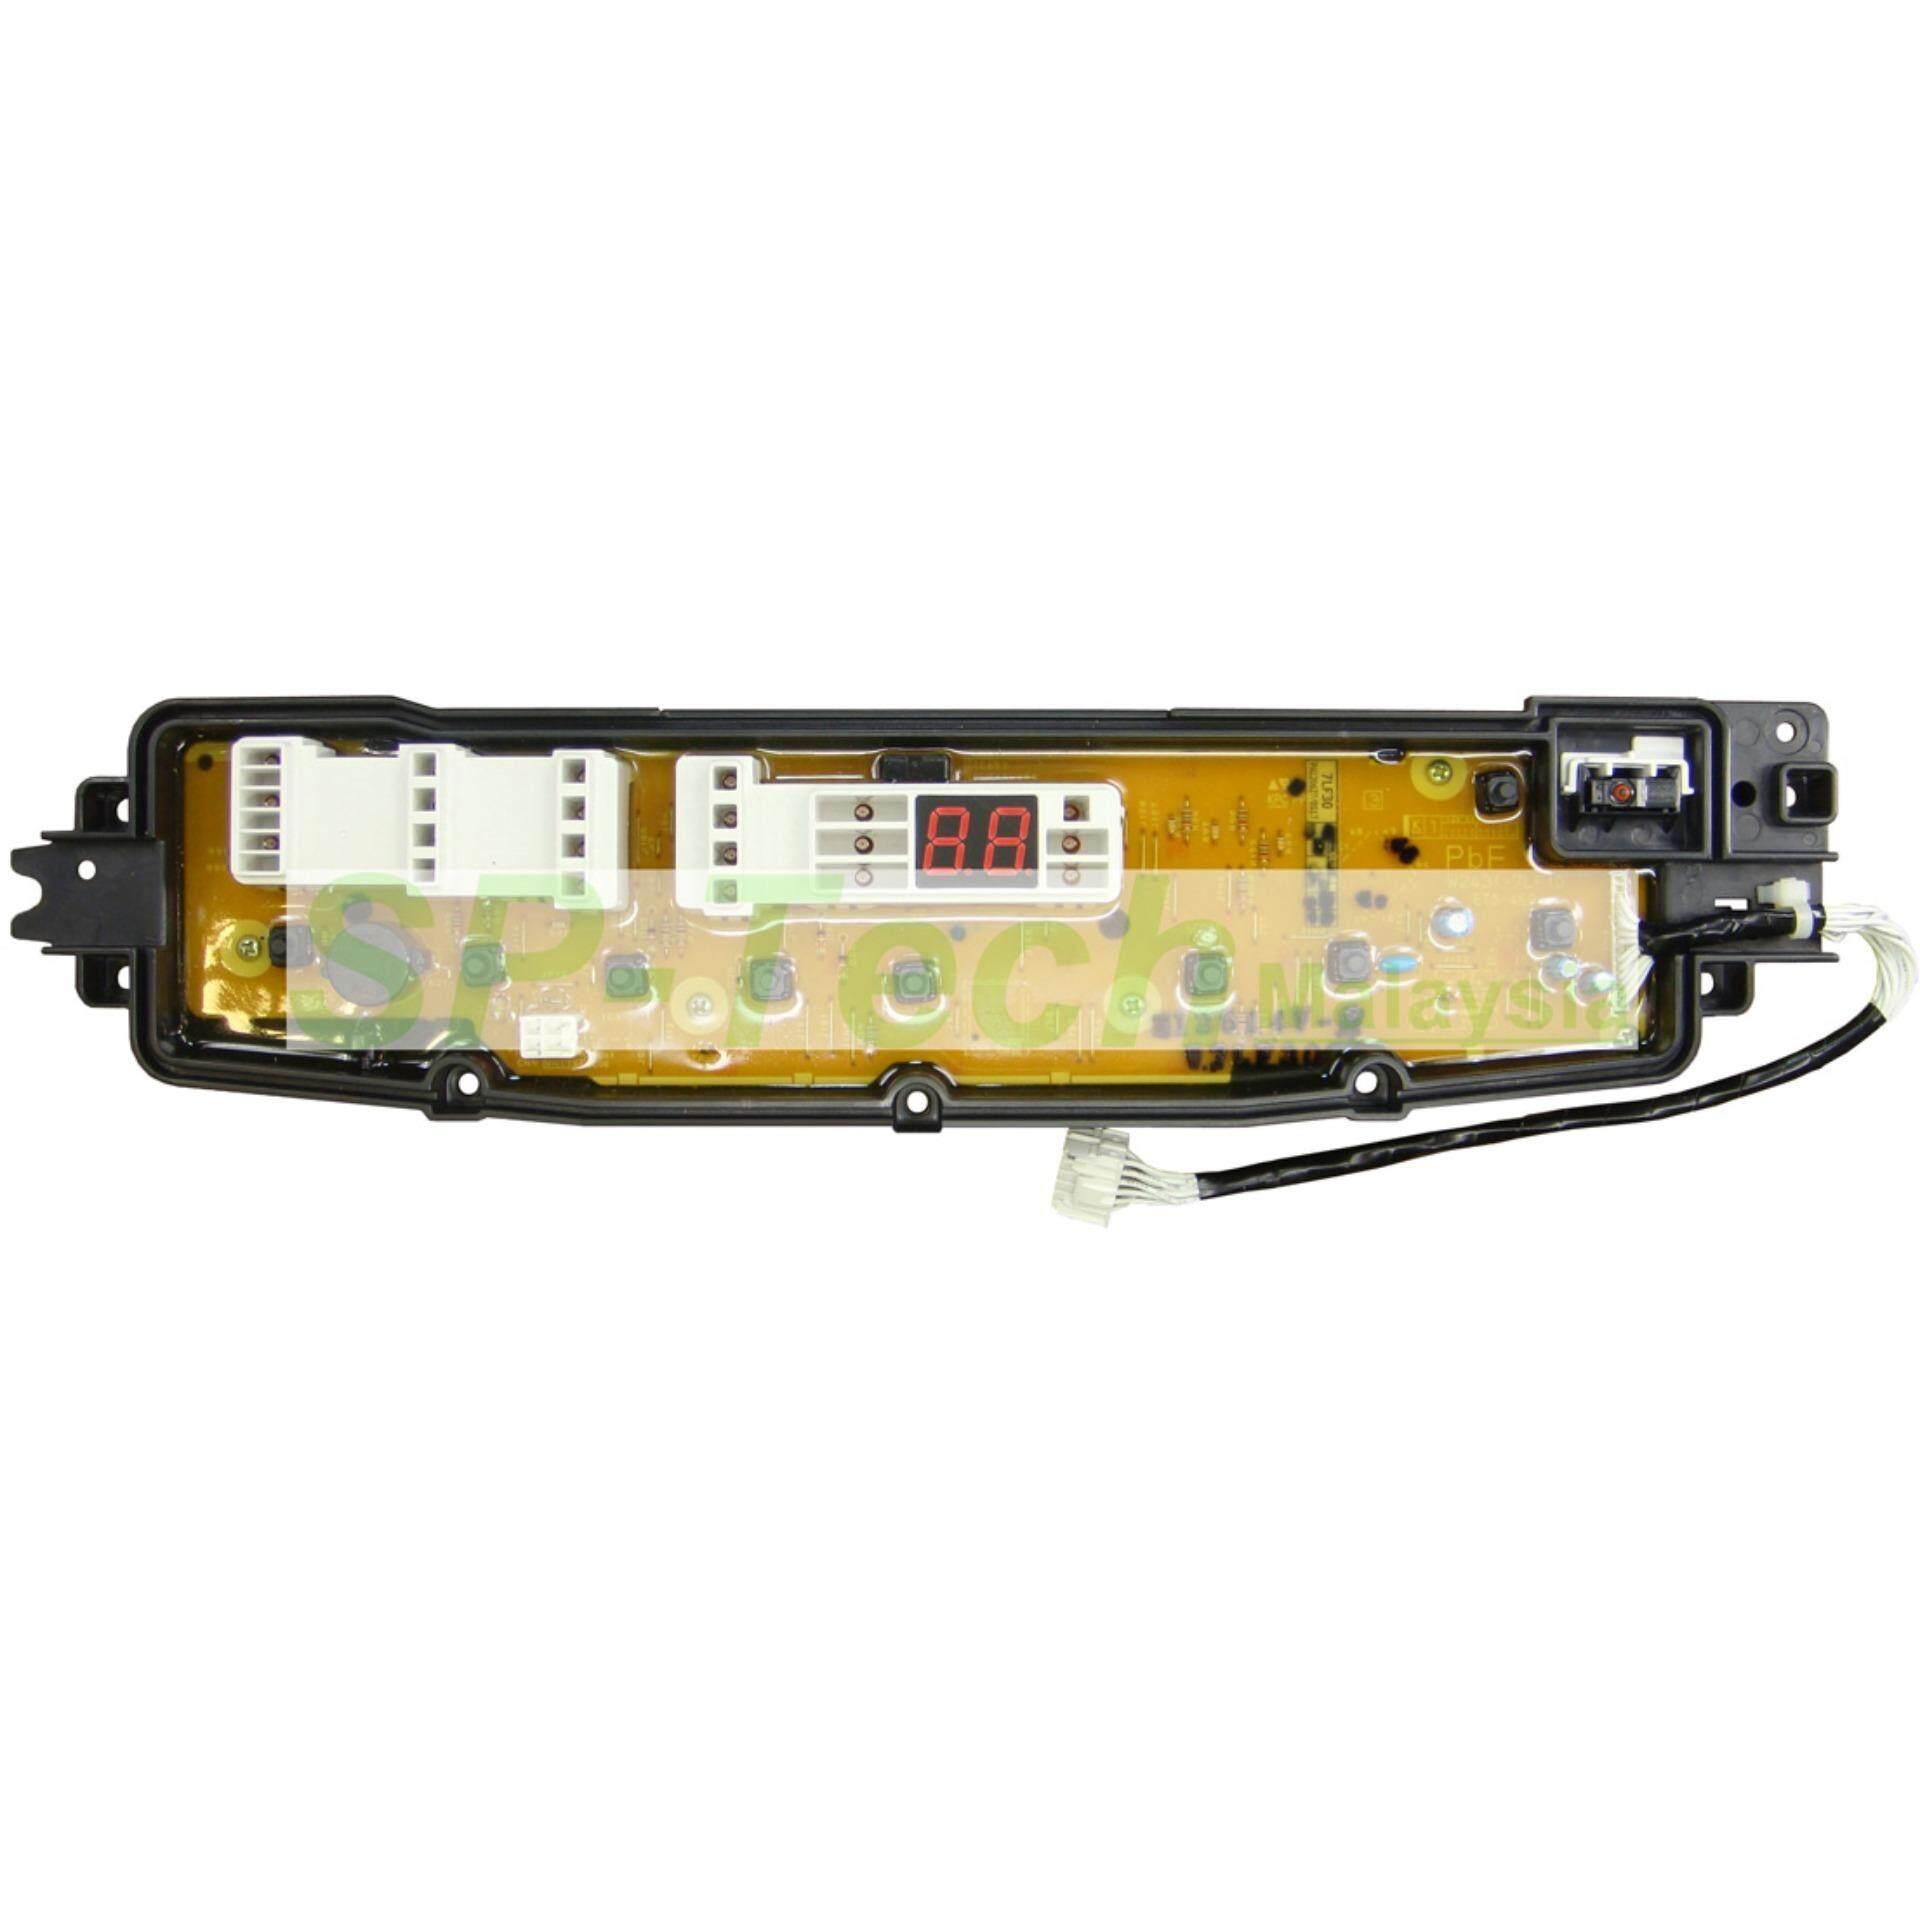 [PRE ORDER] NA-F90B2 PANASONIC WASHING MACHINE PCB BOARD-ORIGINAL